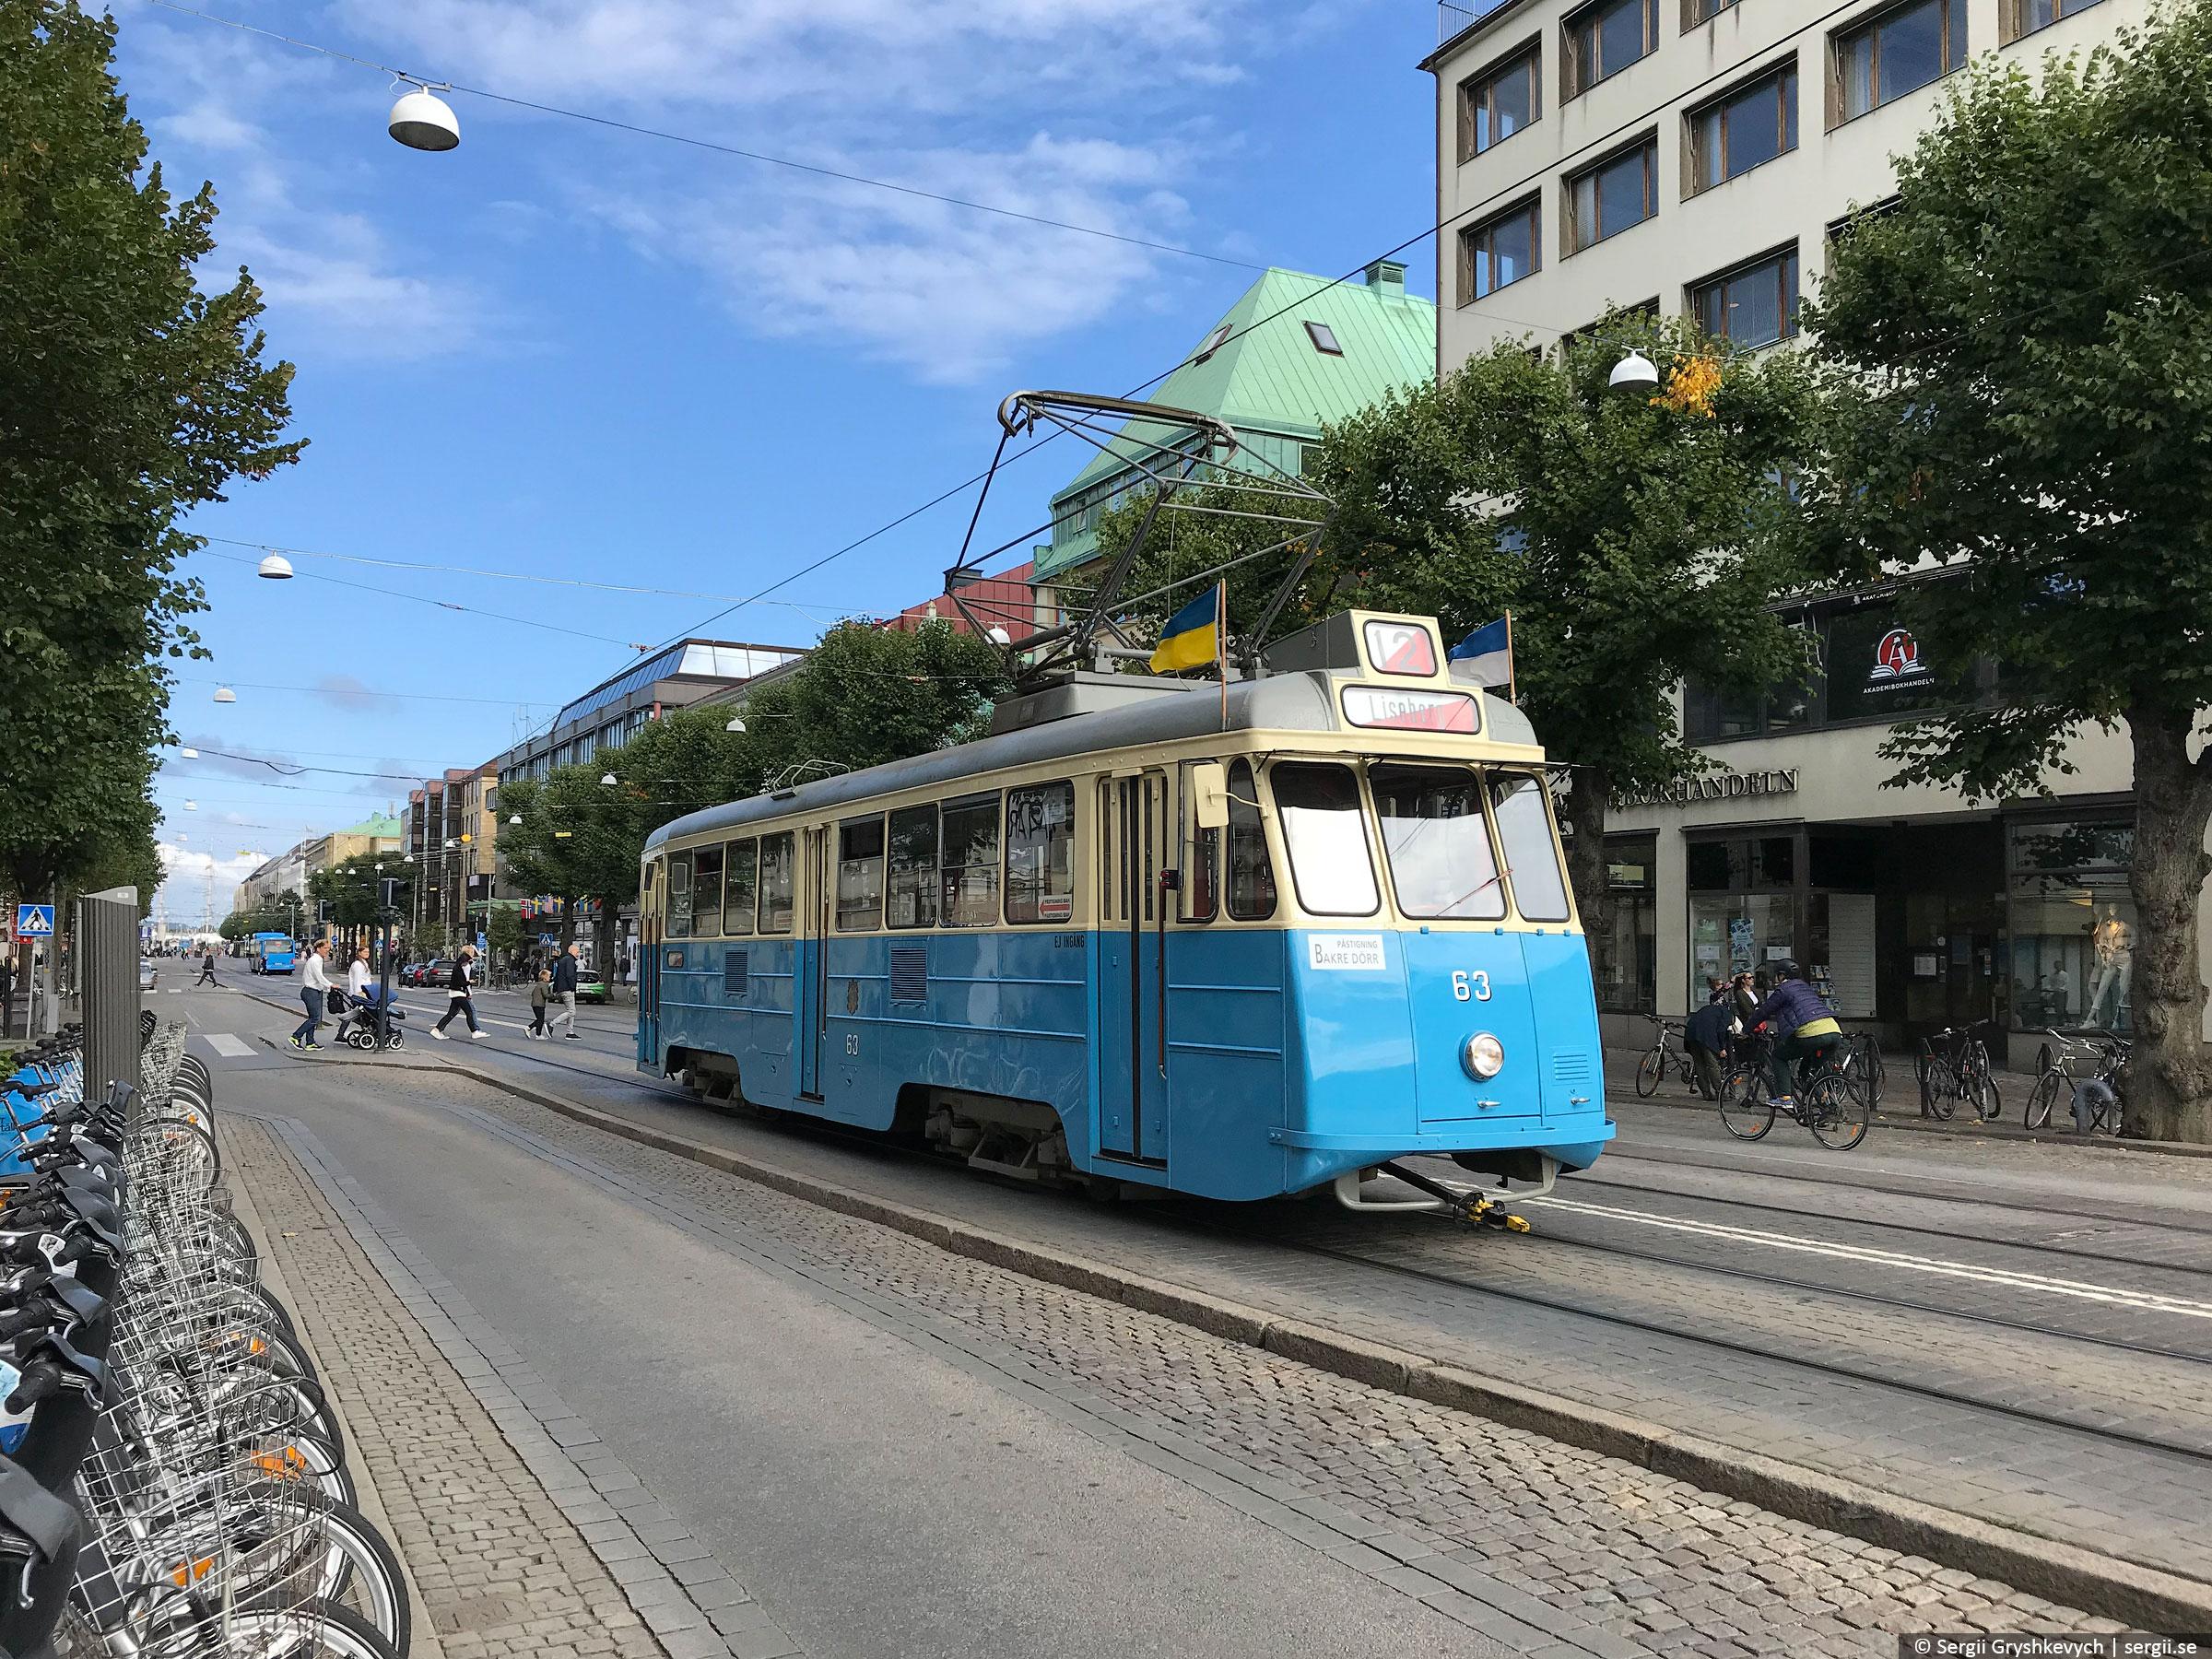 göteborg-ghotenburg-sweden-2018-14